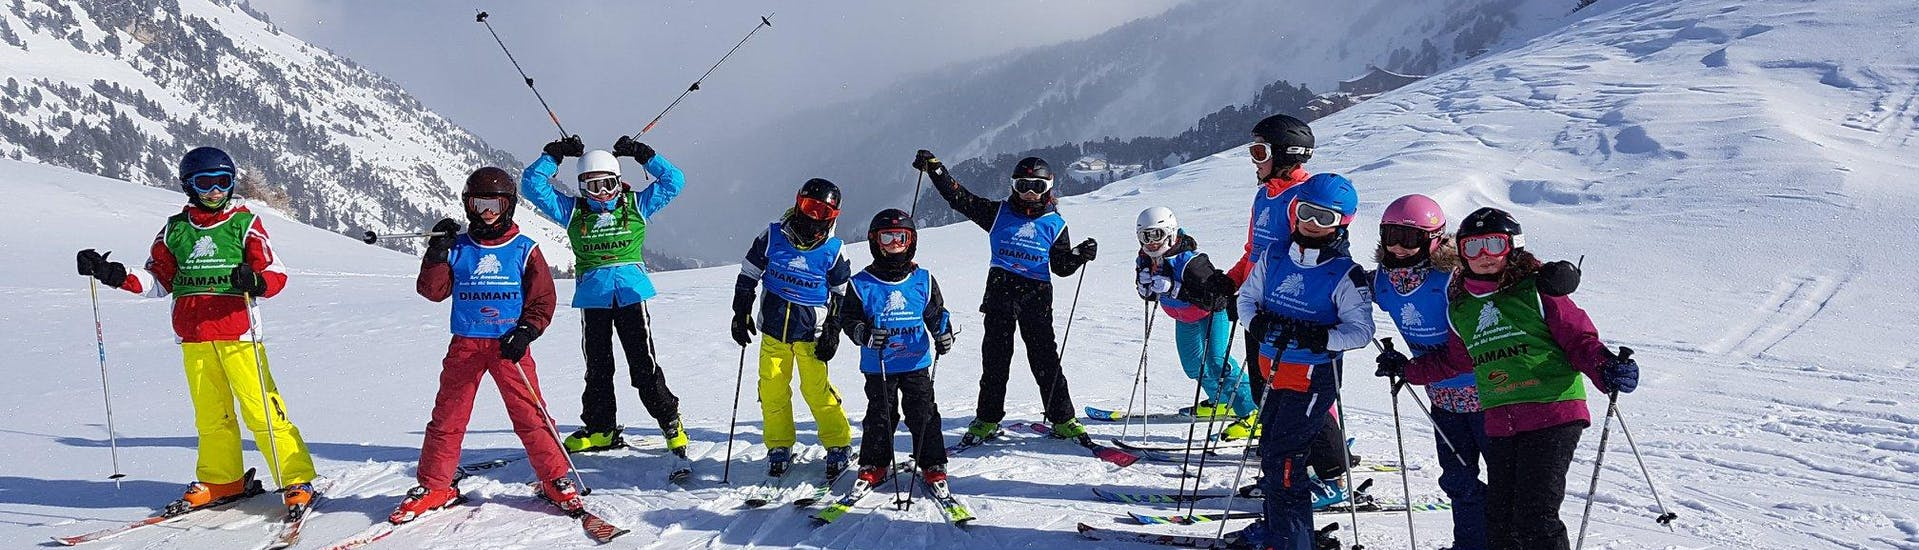 ski-lessons-for-kids-5-12-years-low-season-all-levels-esi-arc-aventure-1800-hero